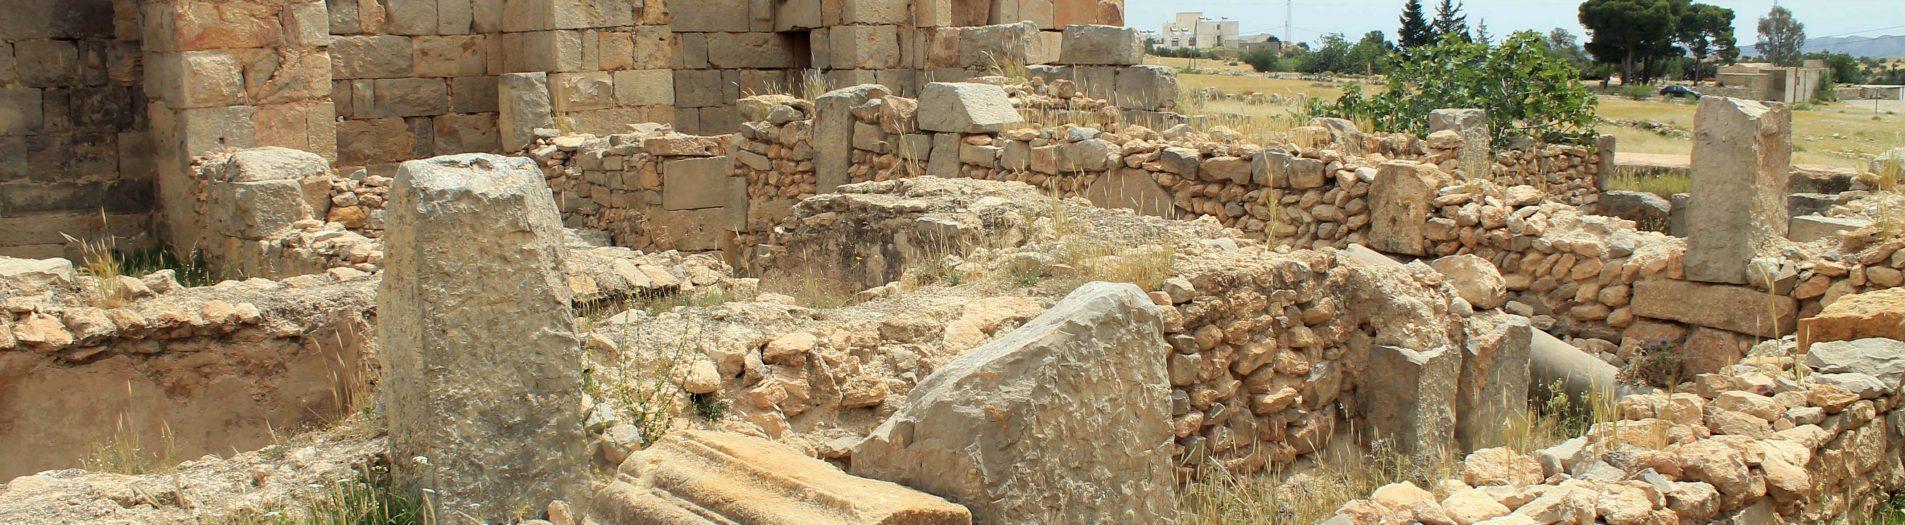 Sur la trace des byzantins en Tunisie